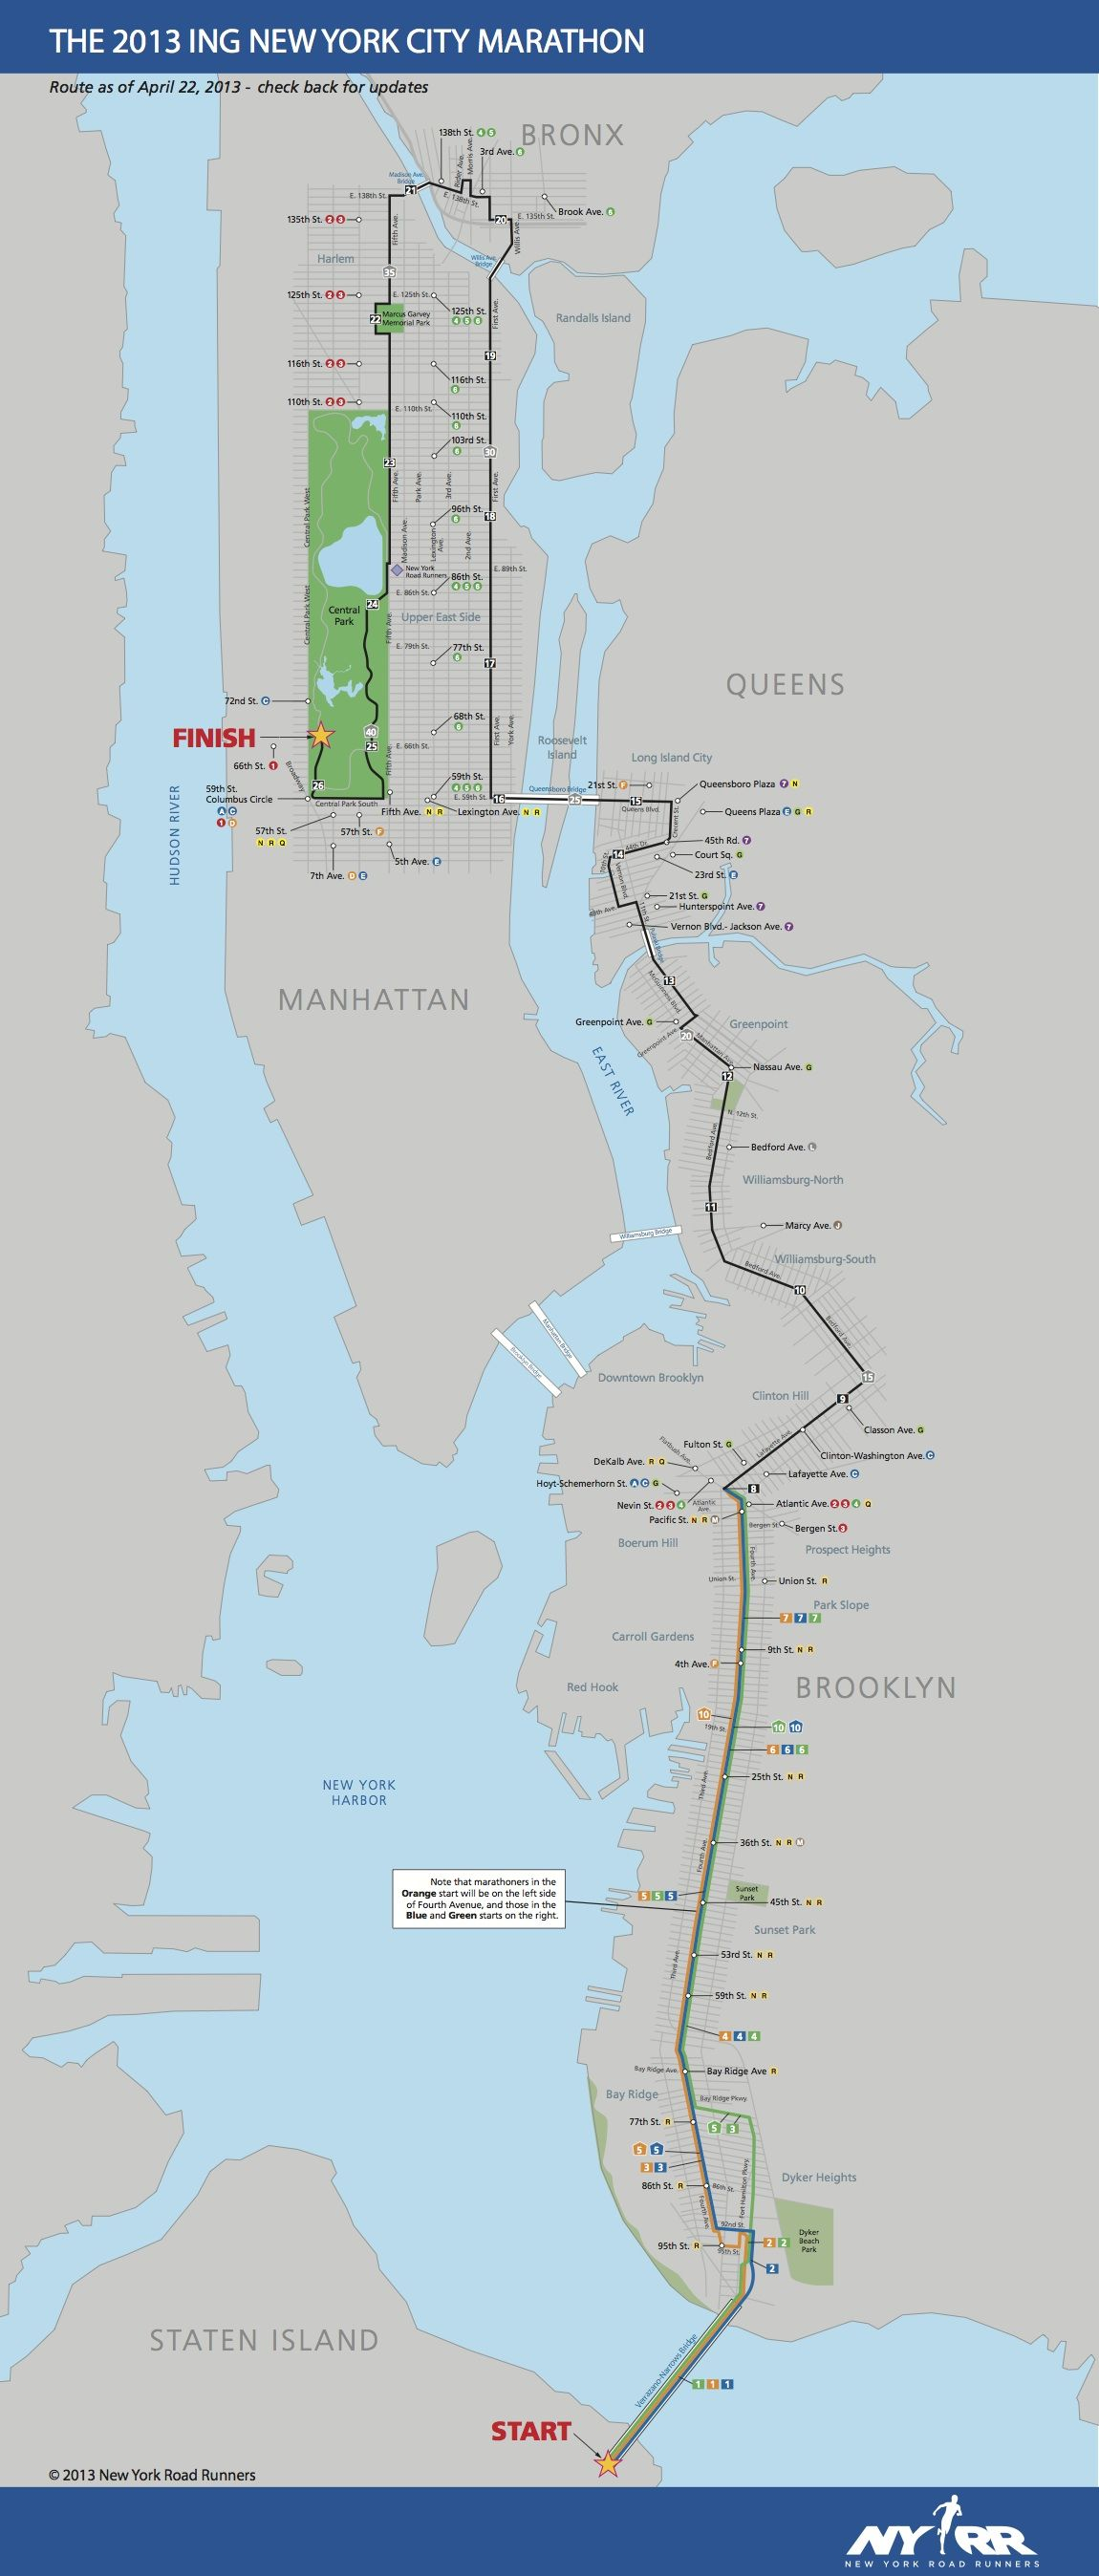 Course Map For Nyc Marathon 2013 Nyc Marathon Marathon New York Marathon